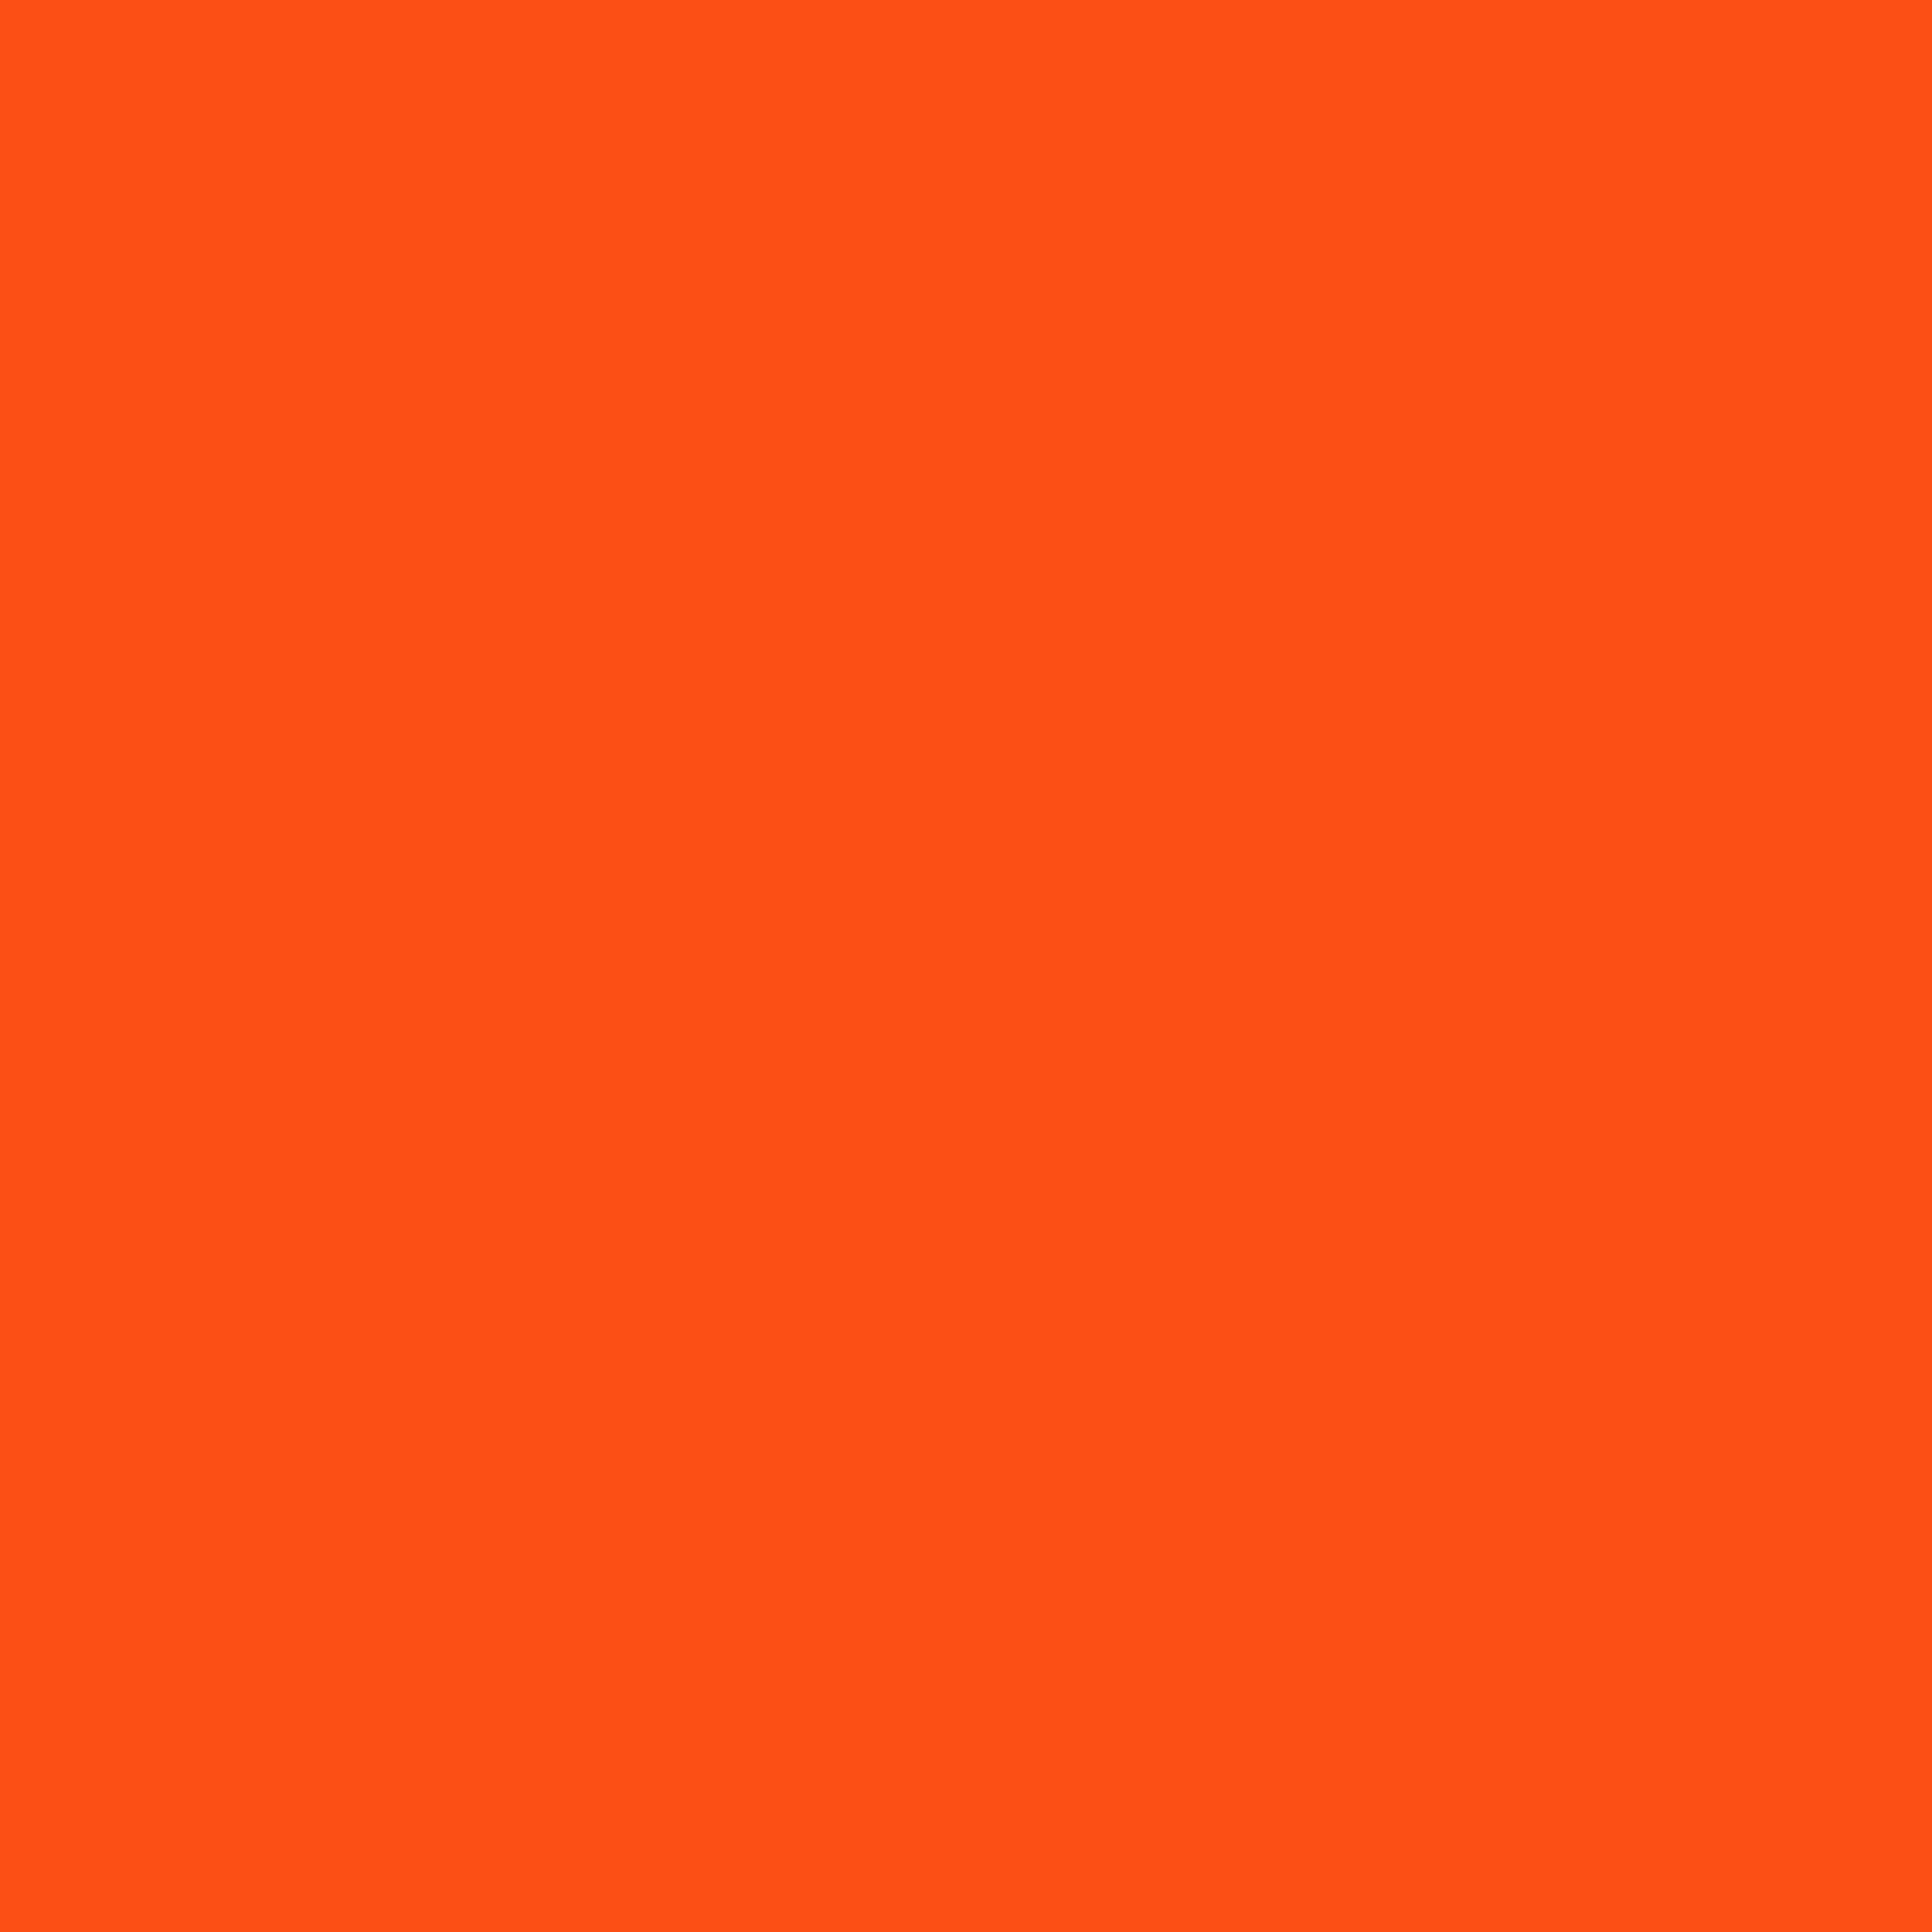 2732x2732 Orioles Orange Solid Color Background